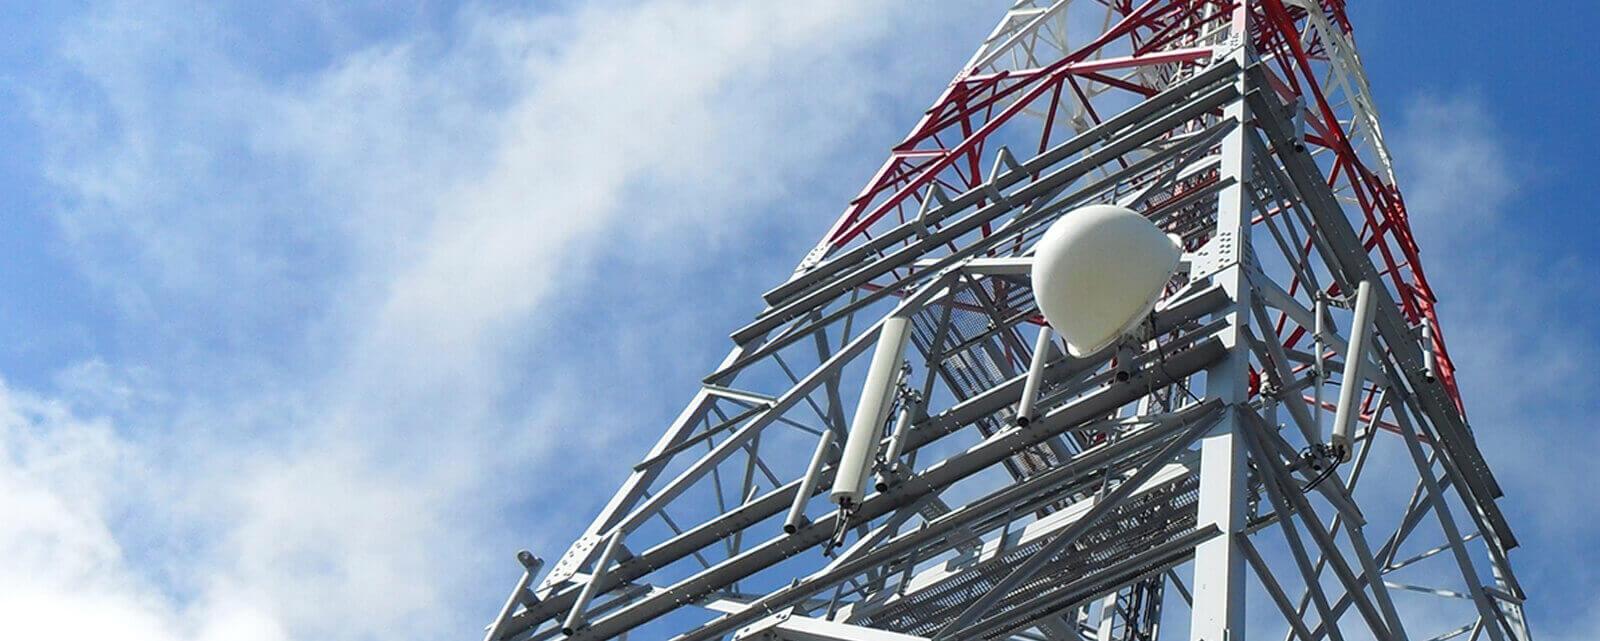 pylon_telecom--1